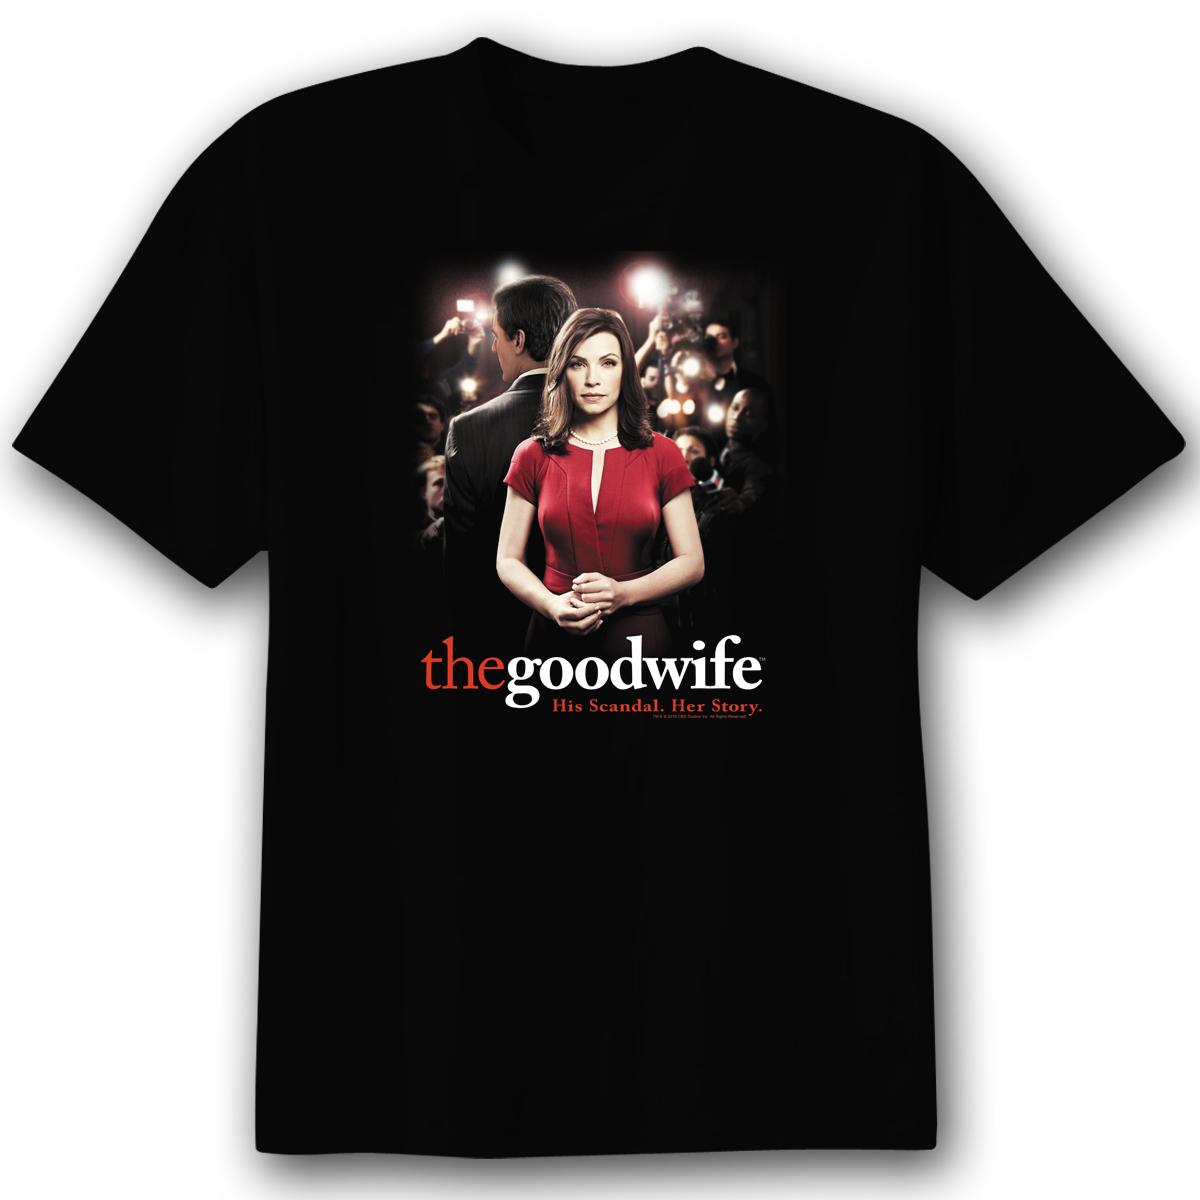 The Good Wife 'Bad Press' Men's T-Shirt